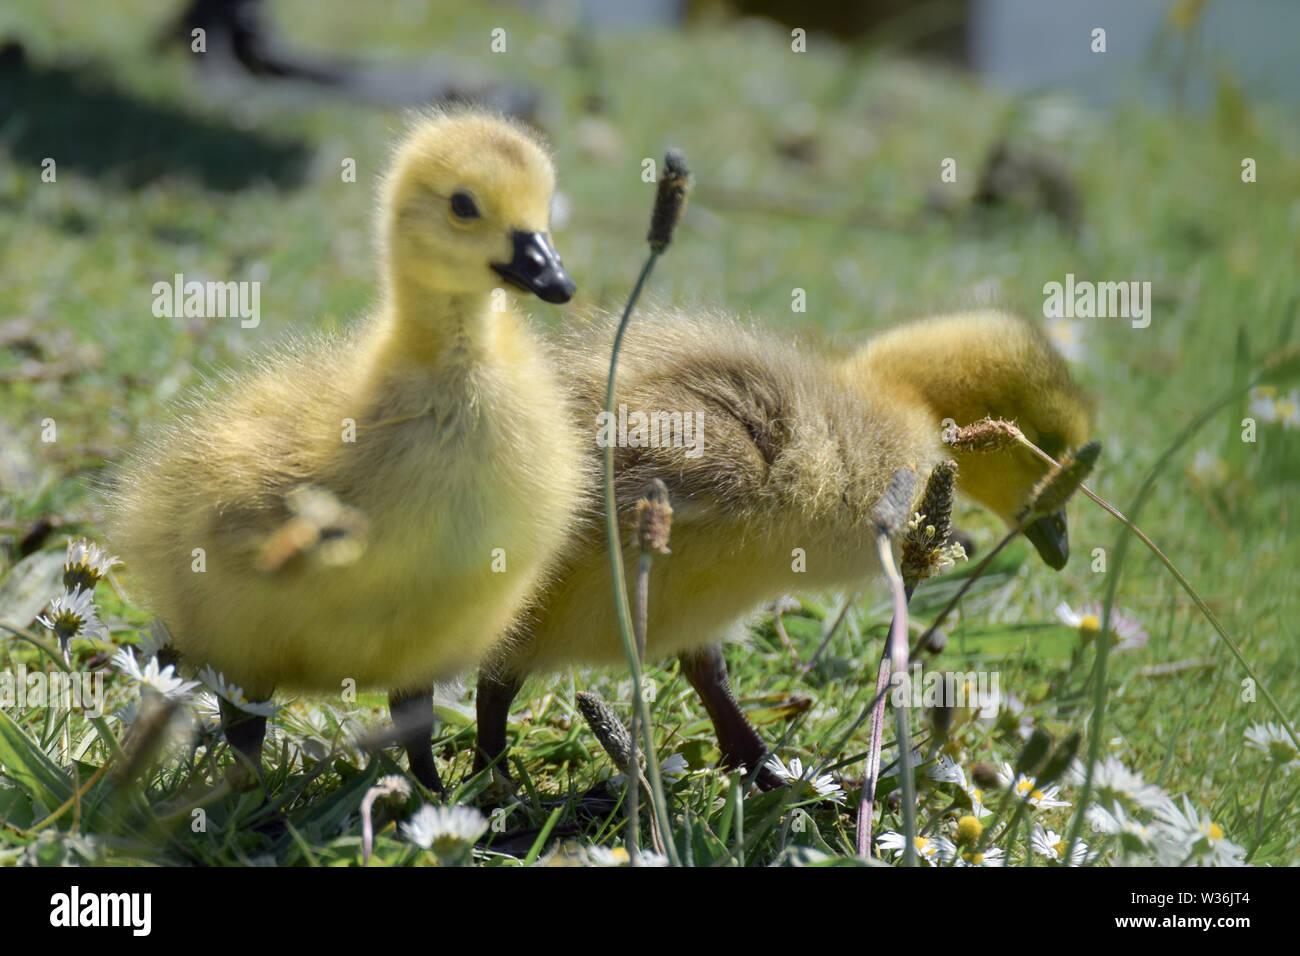 new arrival 5db12 9bd04 Cute Baby Gänse im Gras Stockfoto, Bild: 260145988 - Alamy